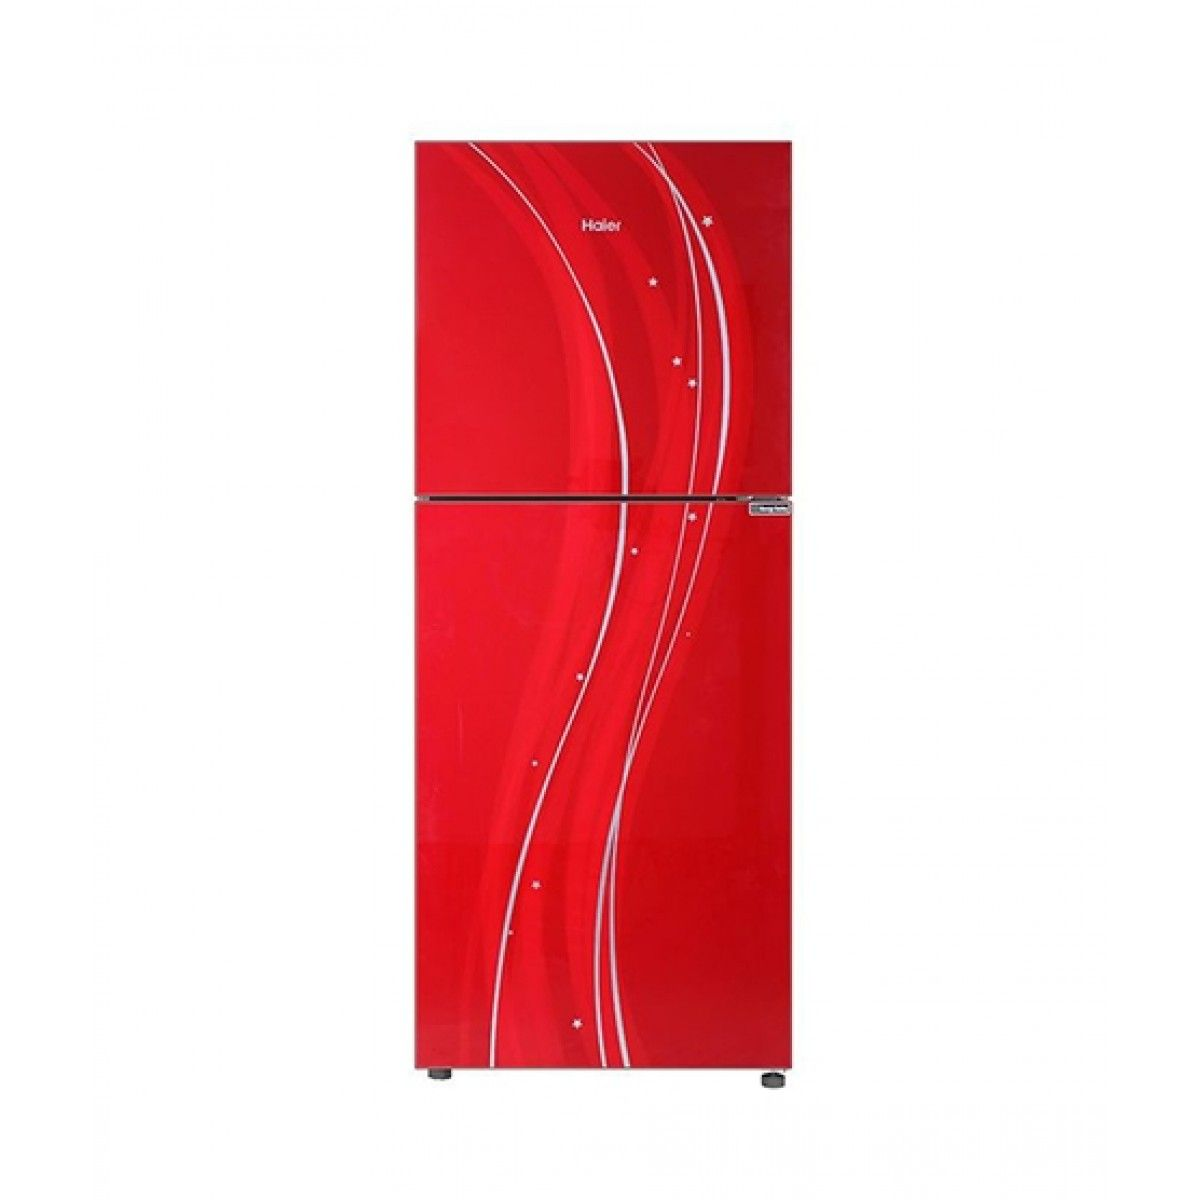 Haier HRF-276EPR 8.5 Cu Ft Refrigerator Red